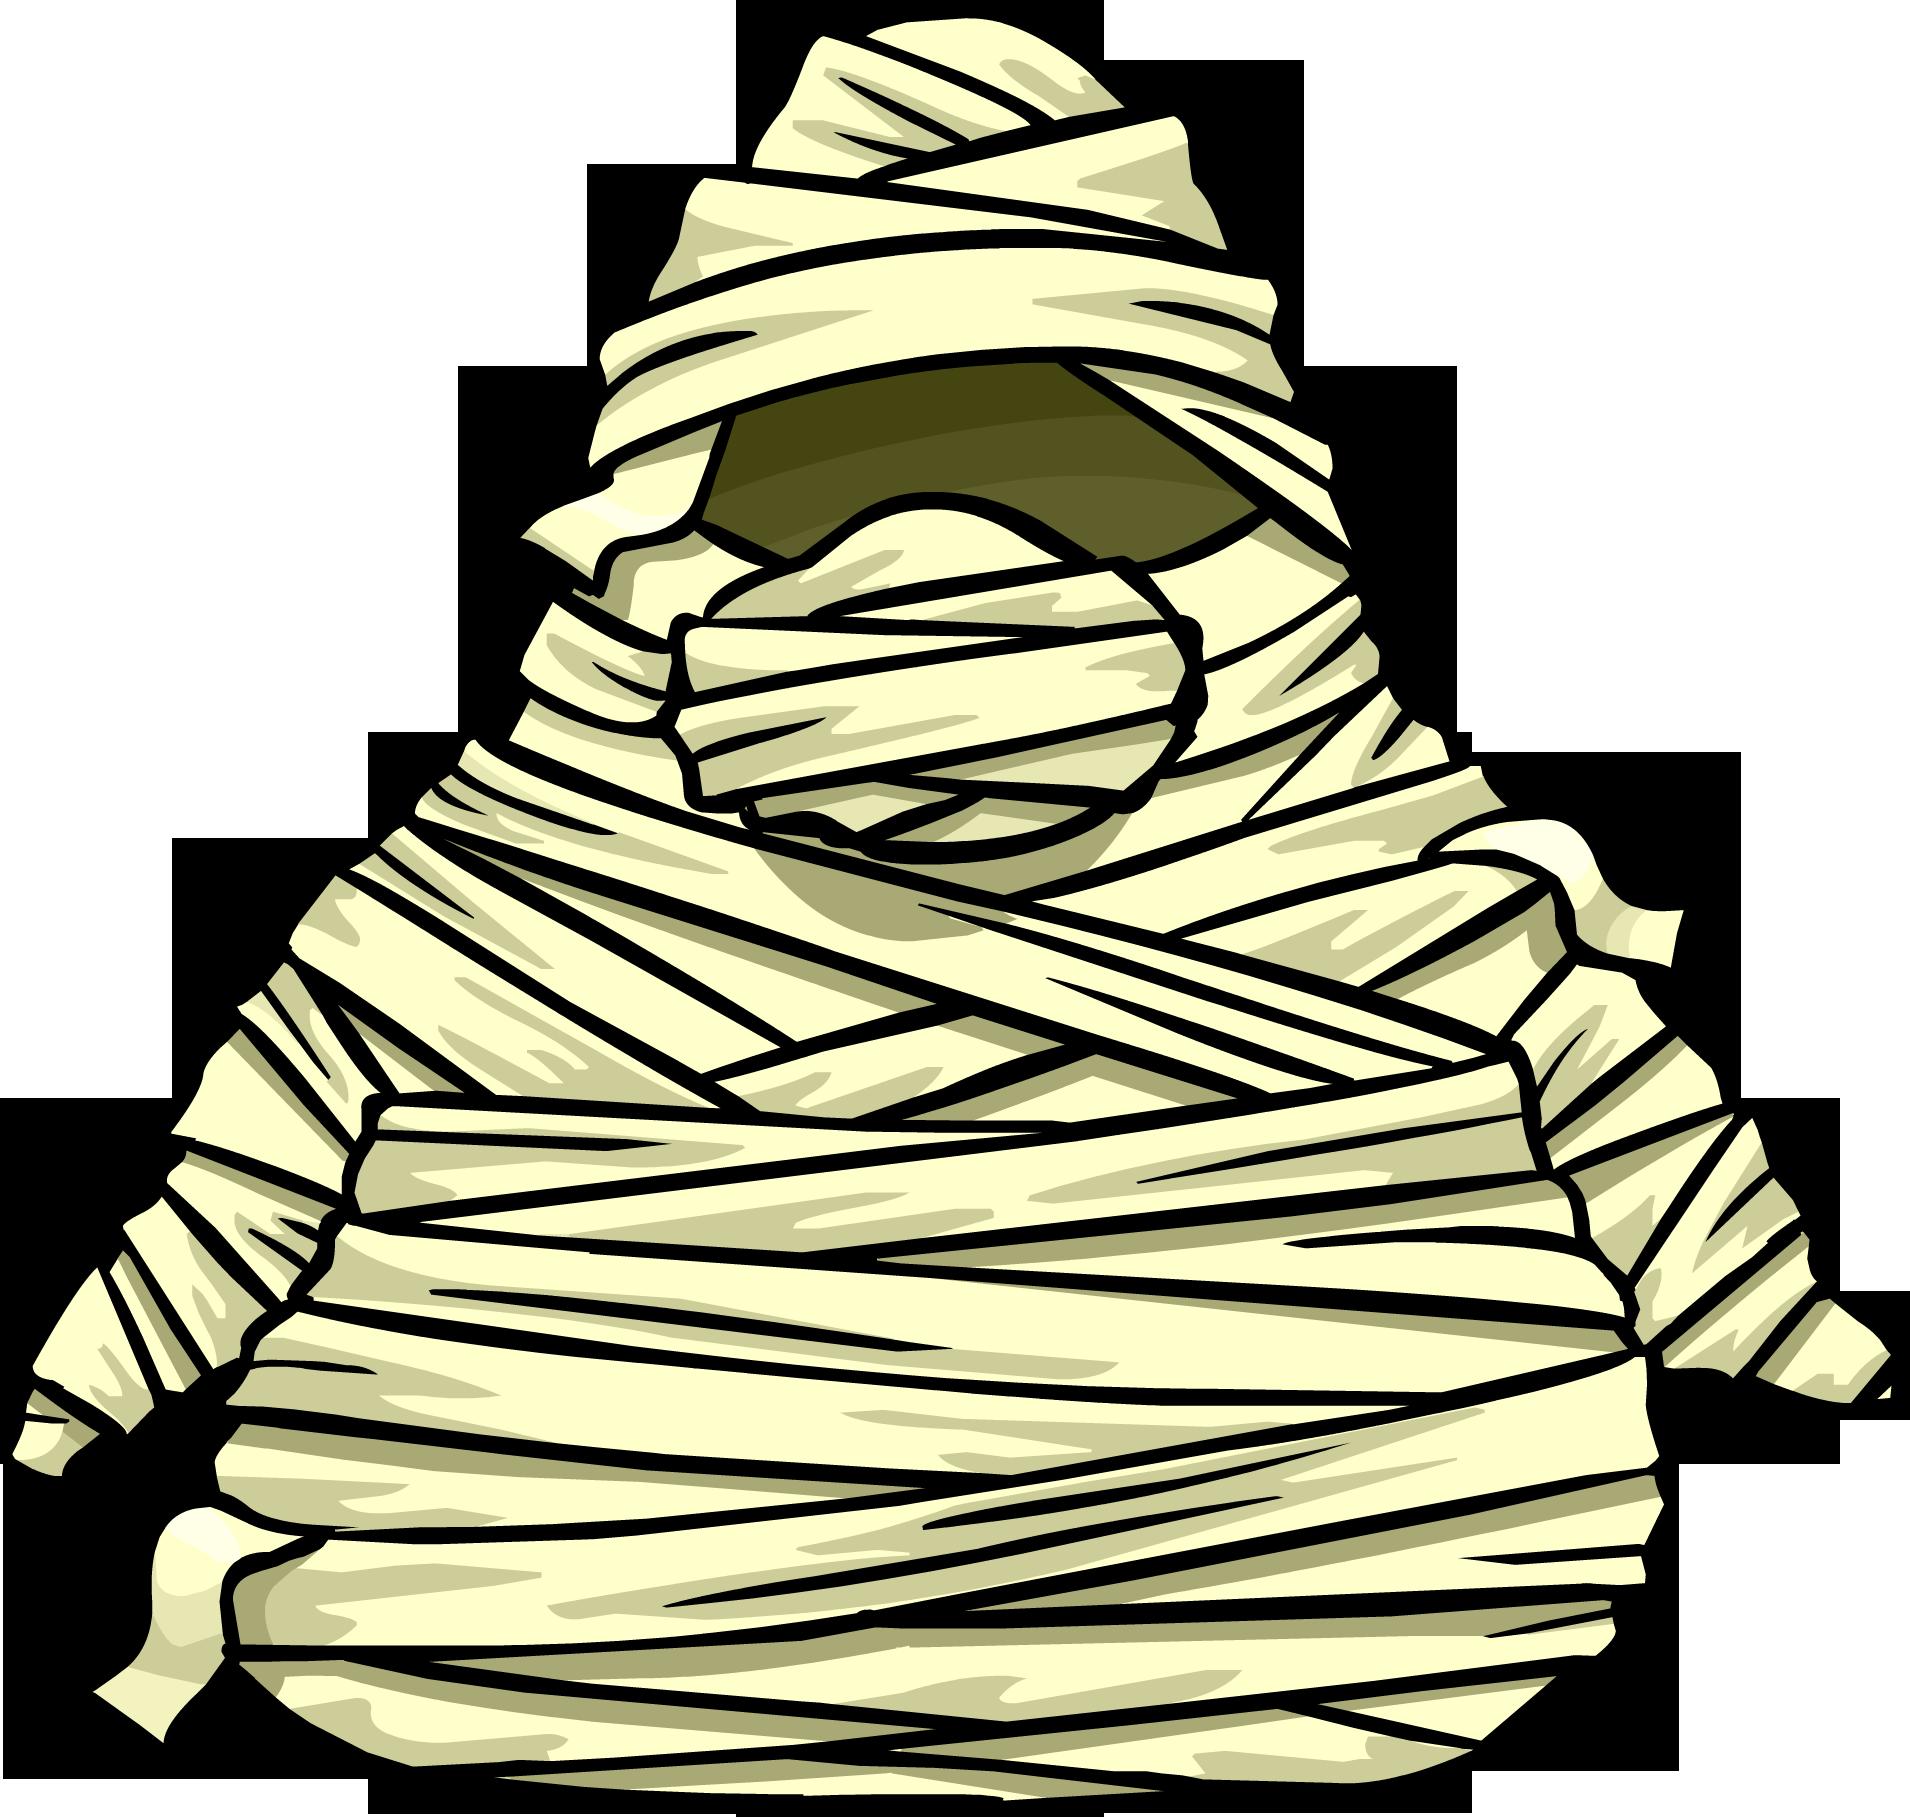 Mummy clipart free images 2 image 3 2